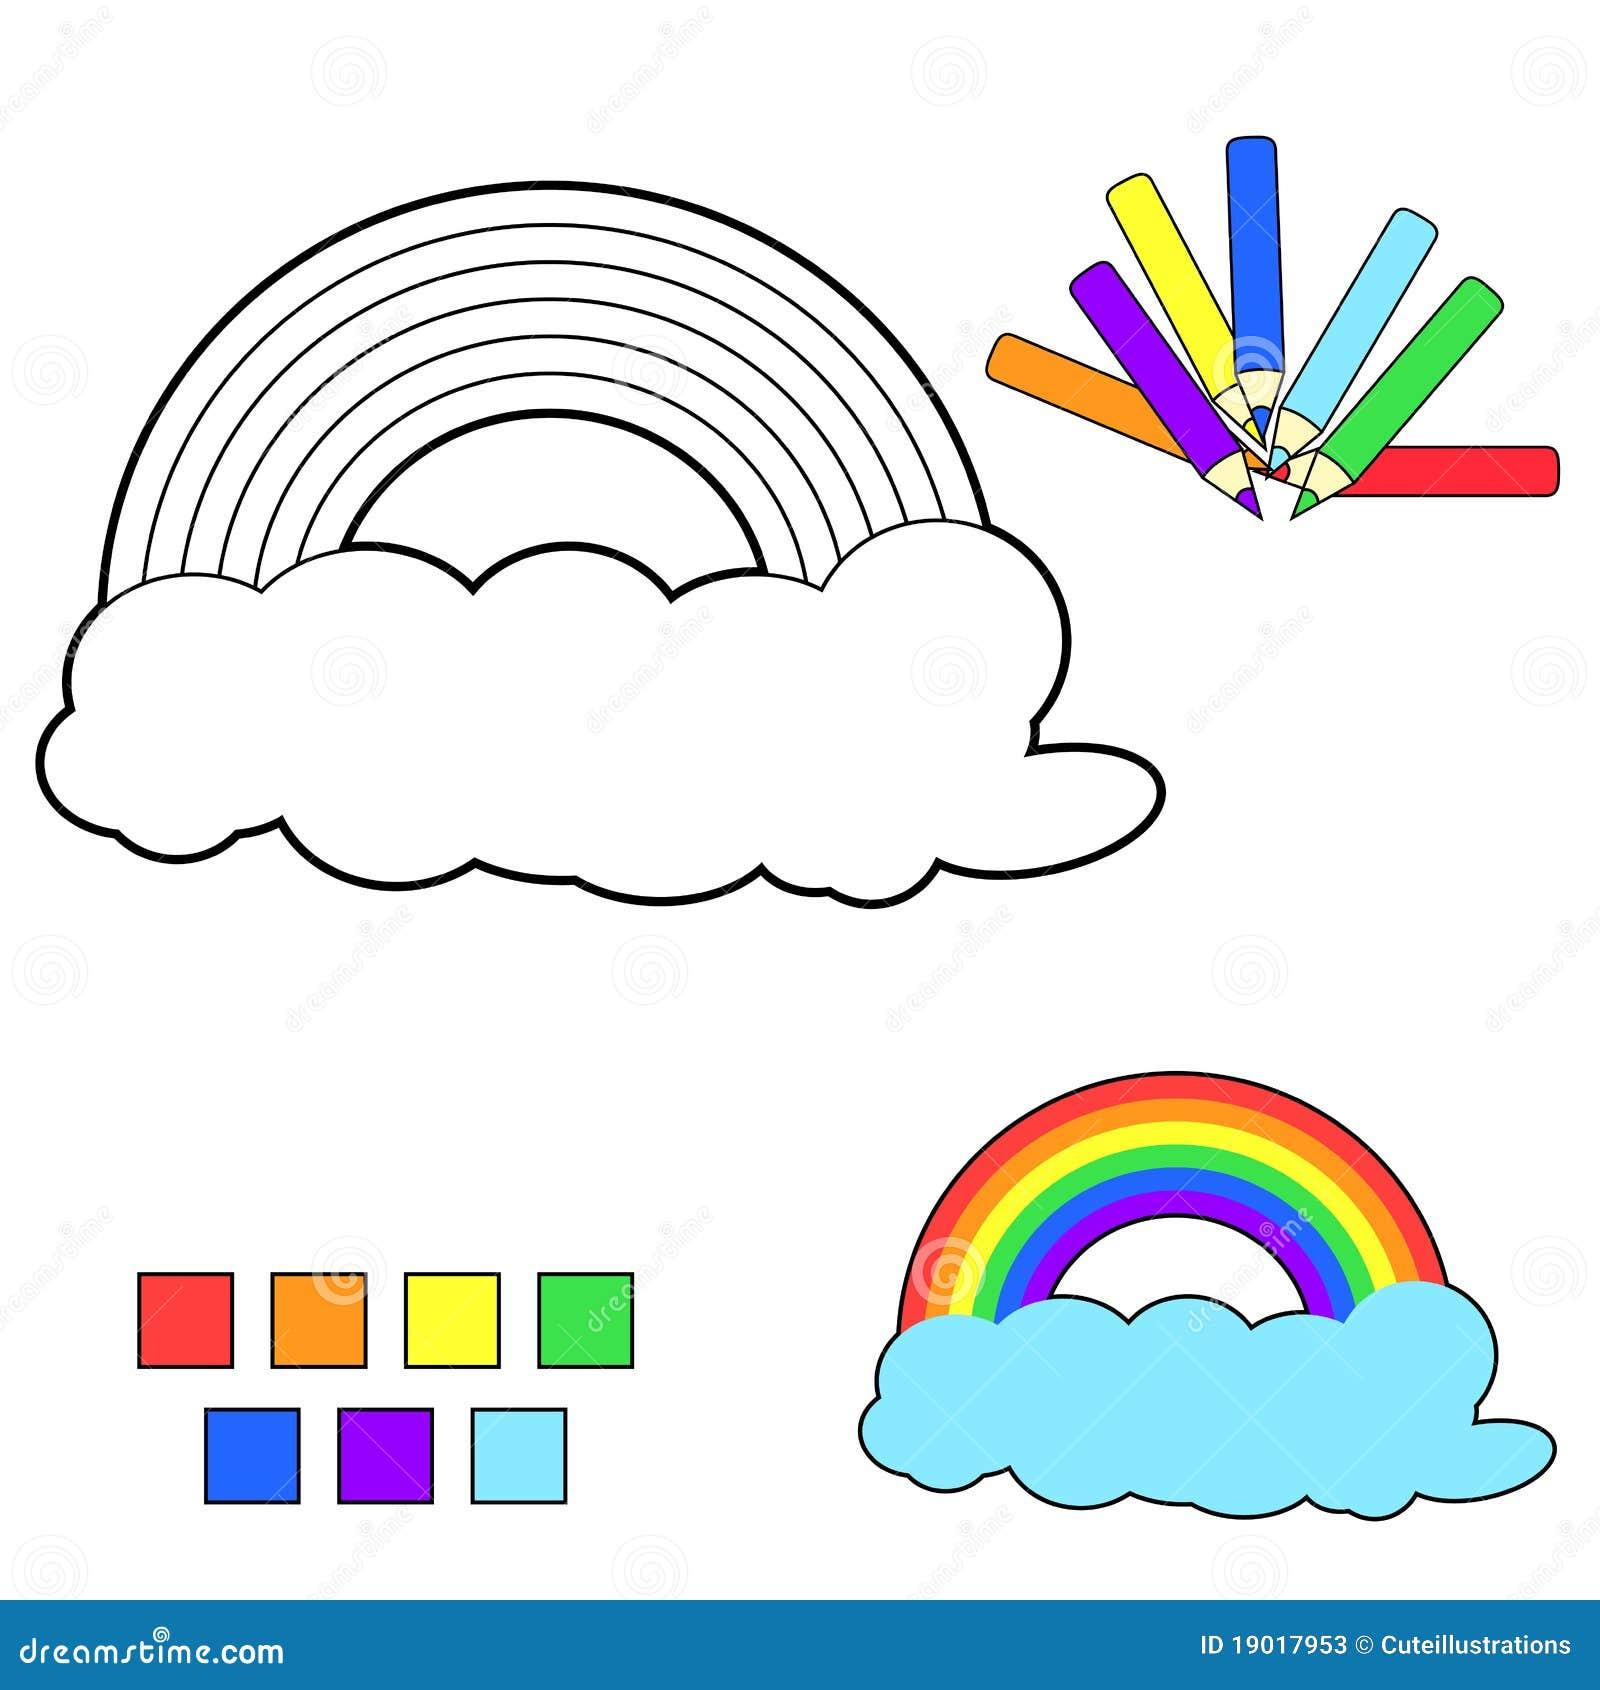 Coloring Book Sketch:rainbow Stock Vector - Illustration of rainbow ...